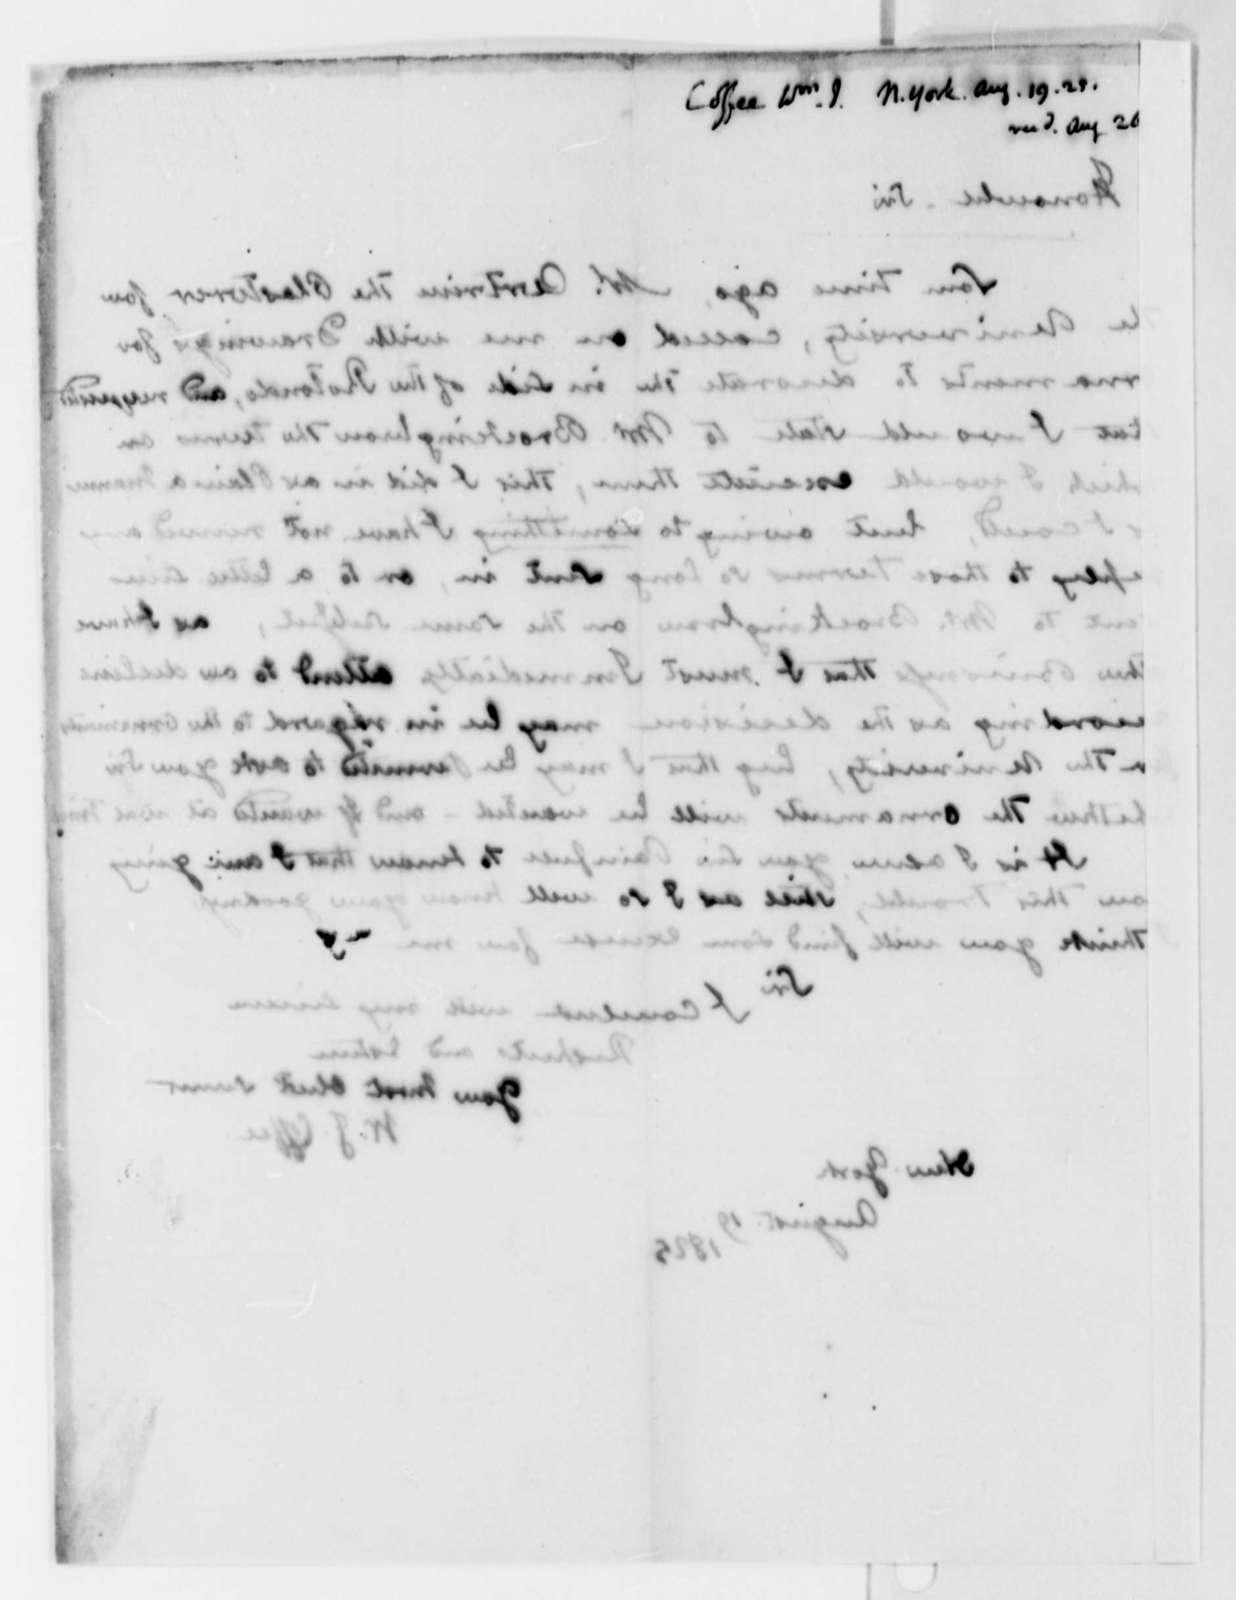 William J. Coffee to Thomas Jefferson, August 19, 1825